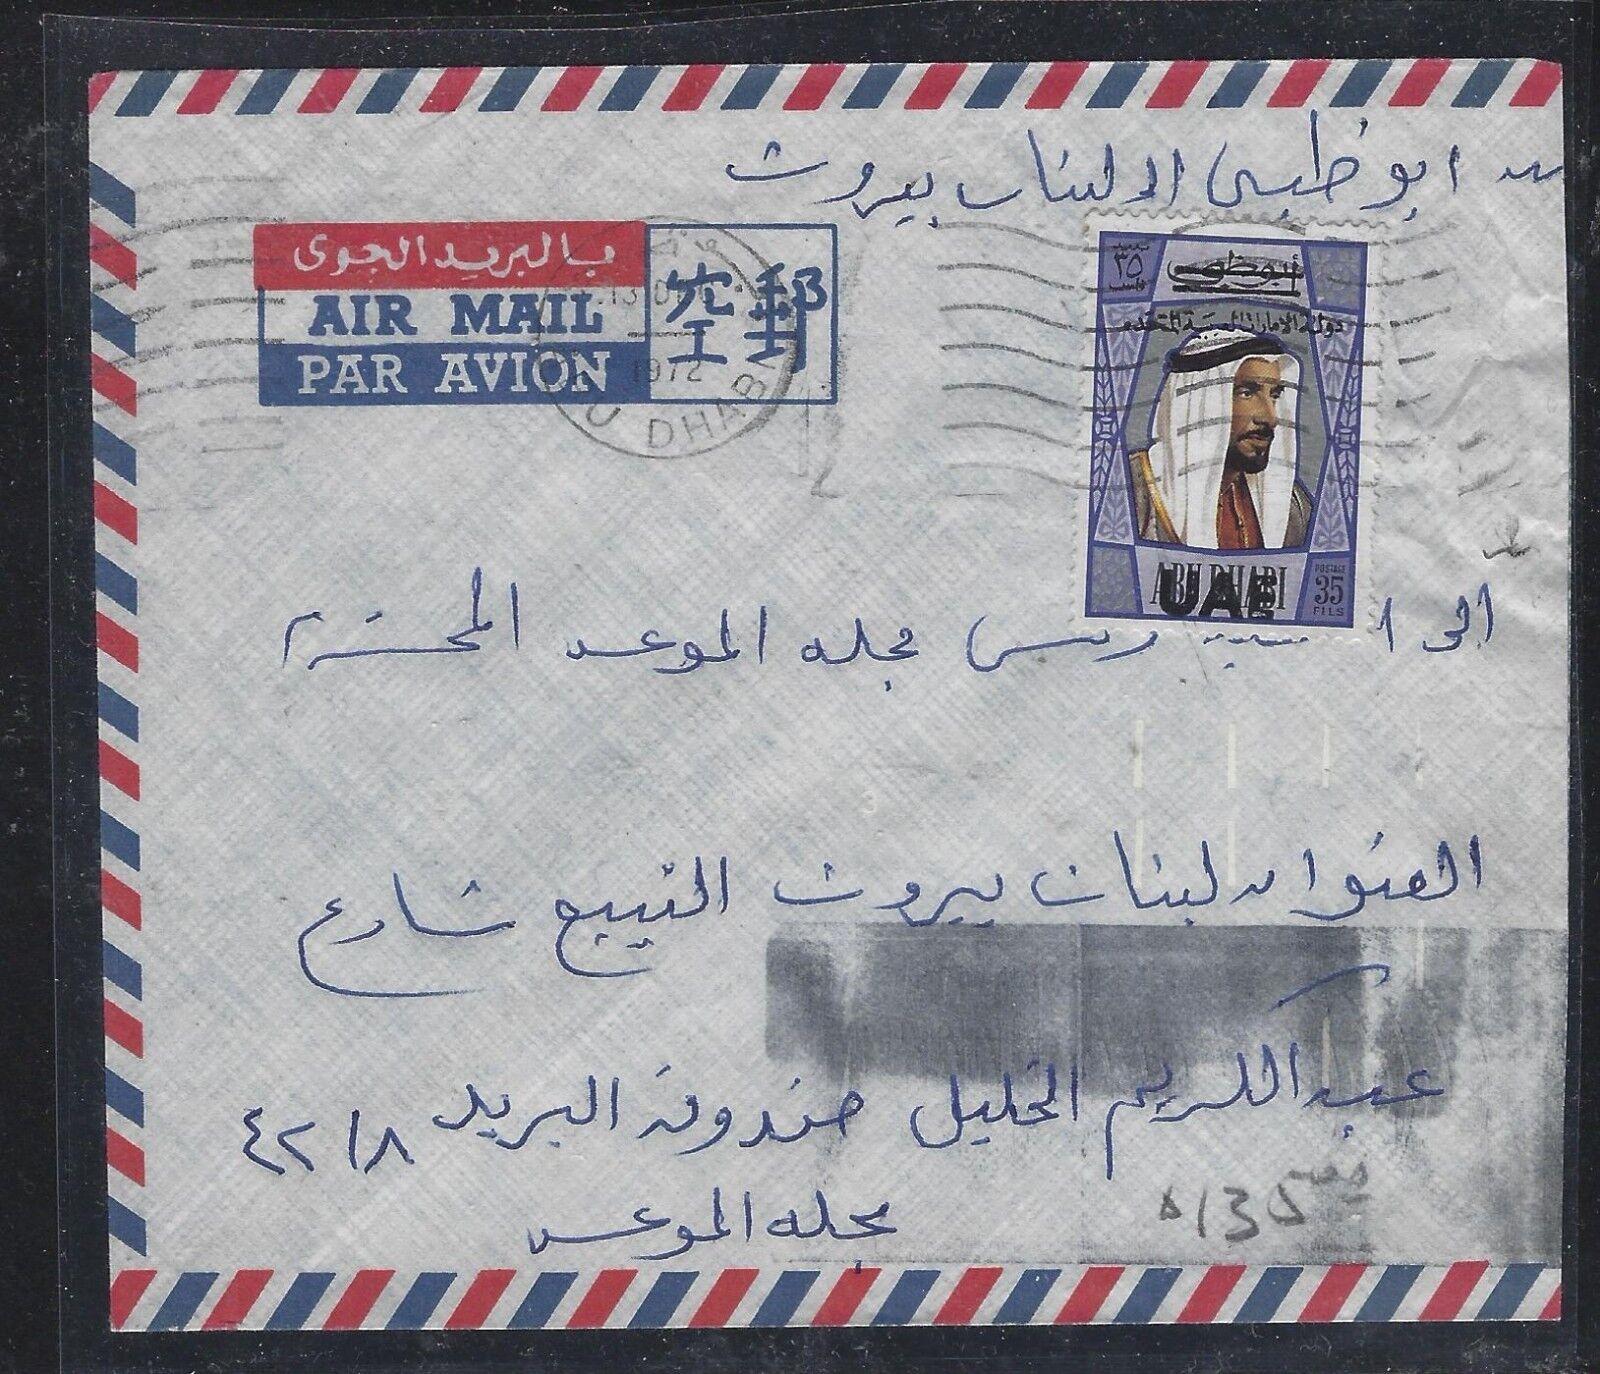 ABU DHABI (P0102BB)  OVPT UAE SHEIKH 35F ON A/M COVER